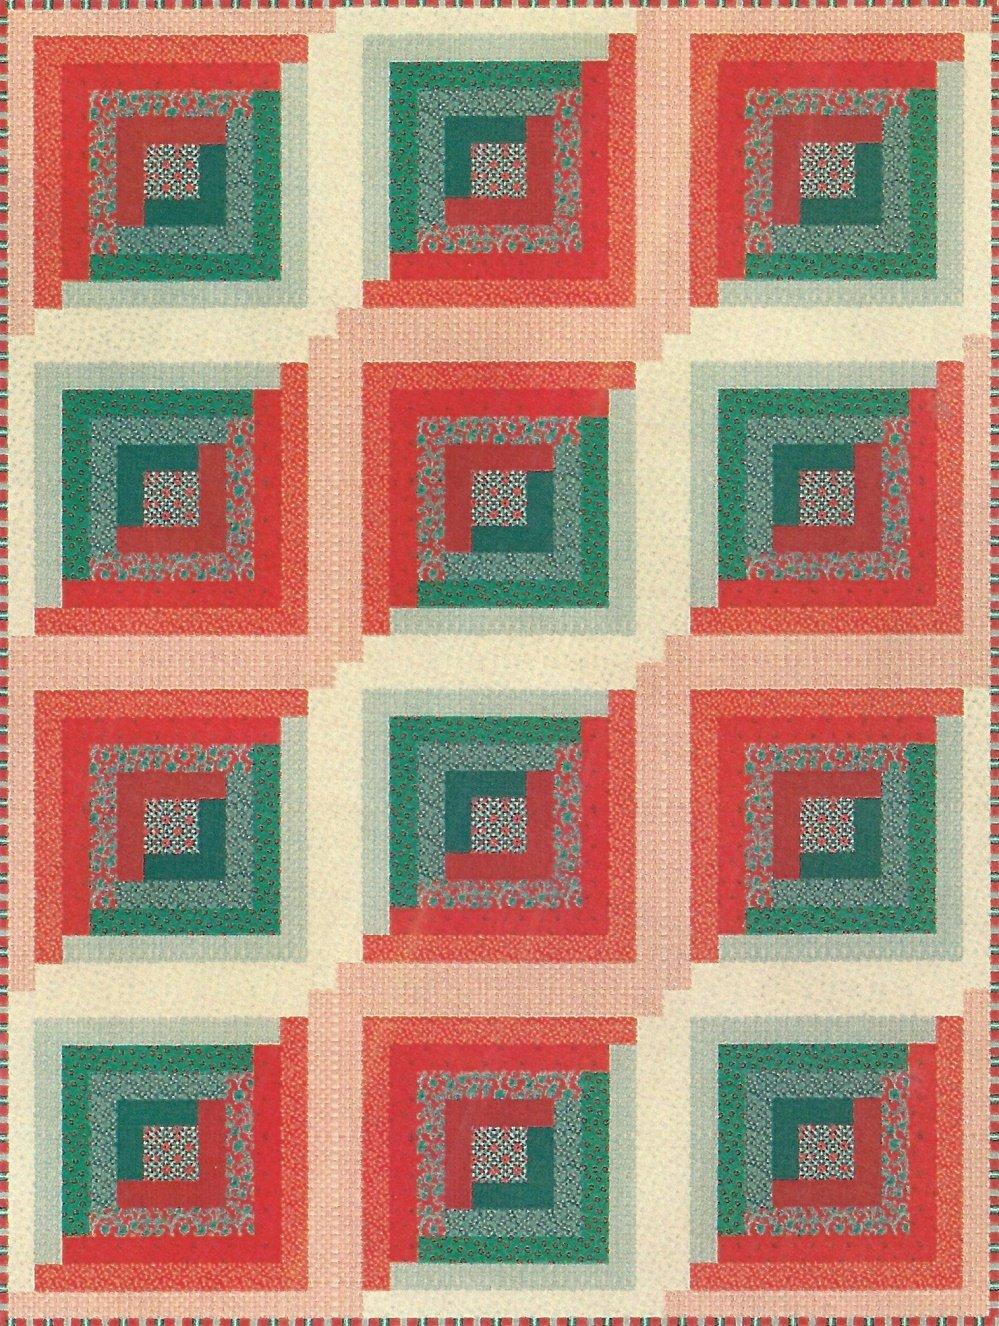 Christmas Logs Flannel Quilt Kit